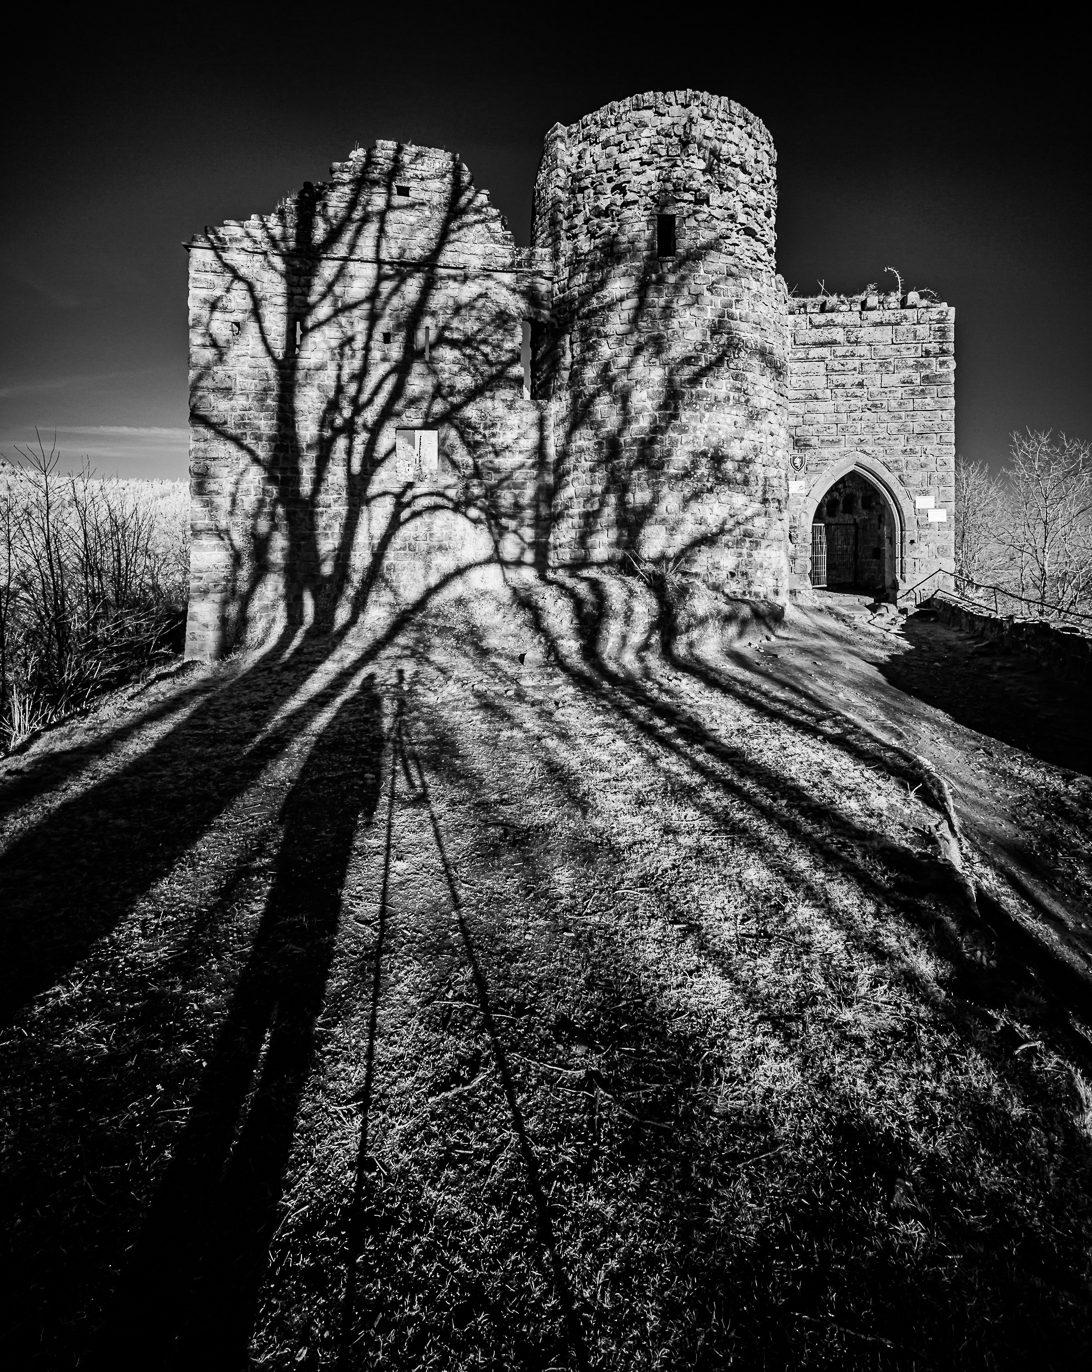 Burg Neuscharfeneck #2